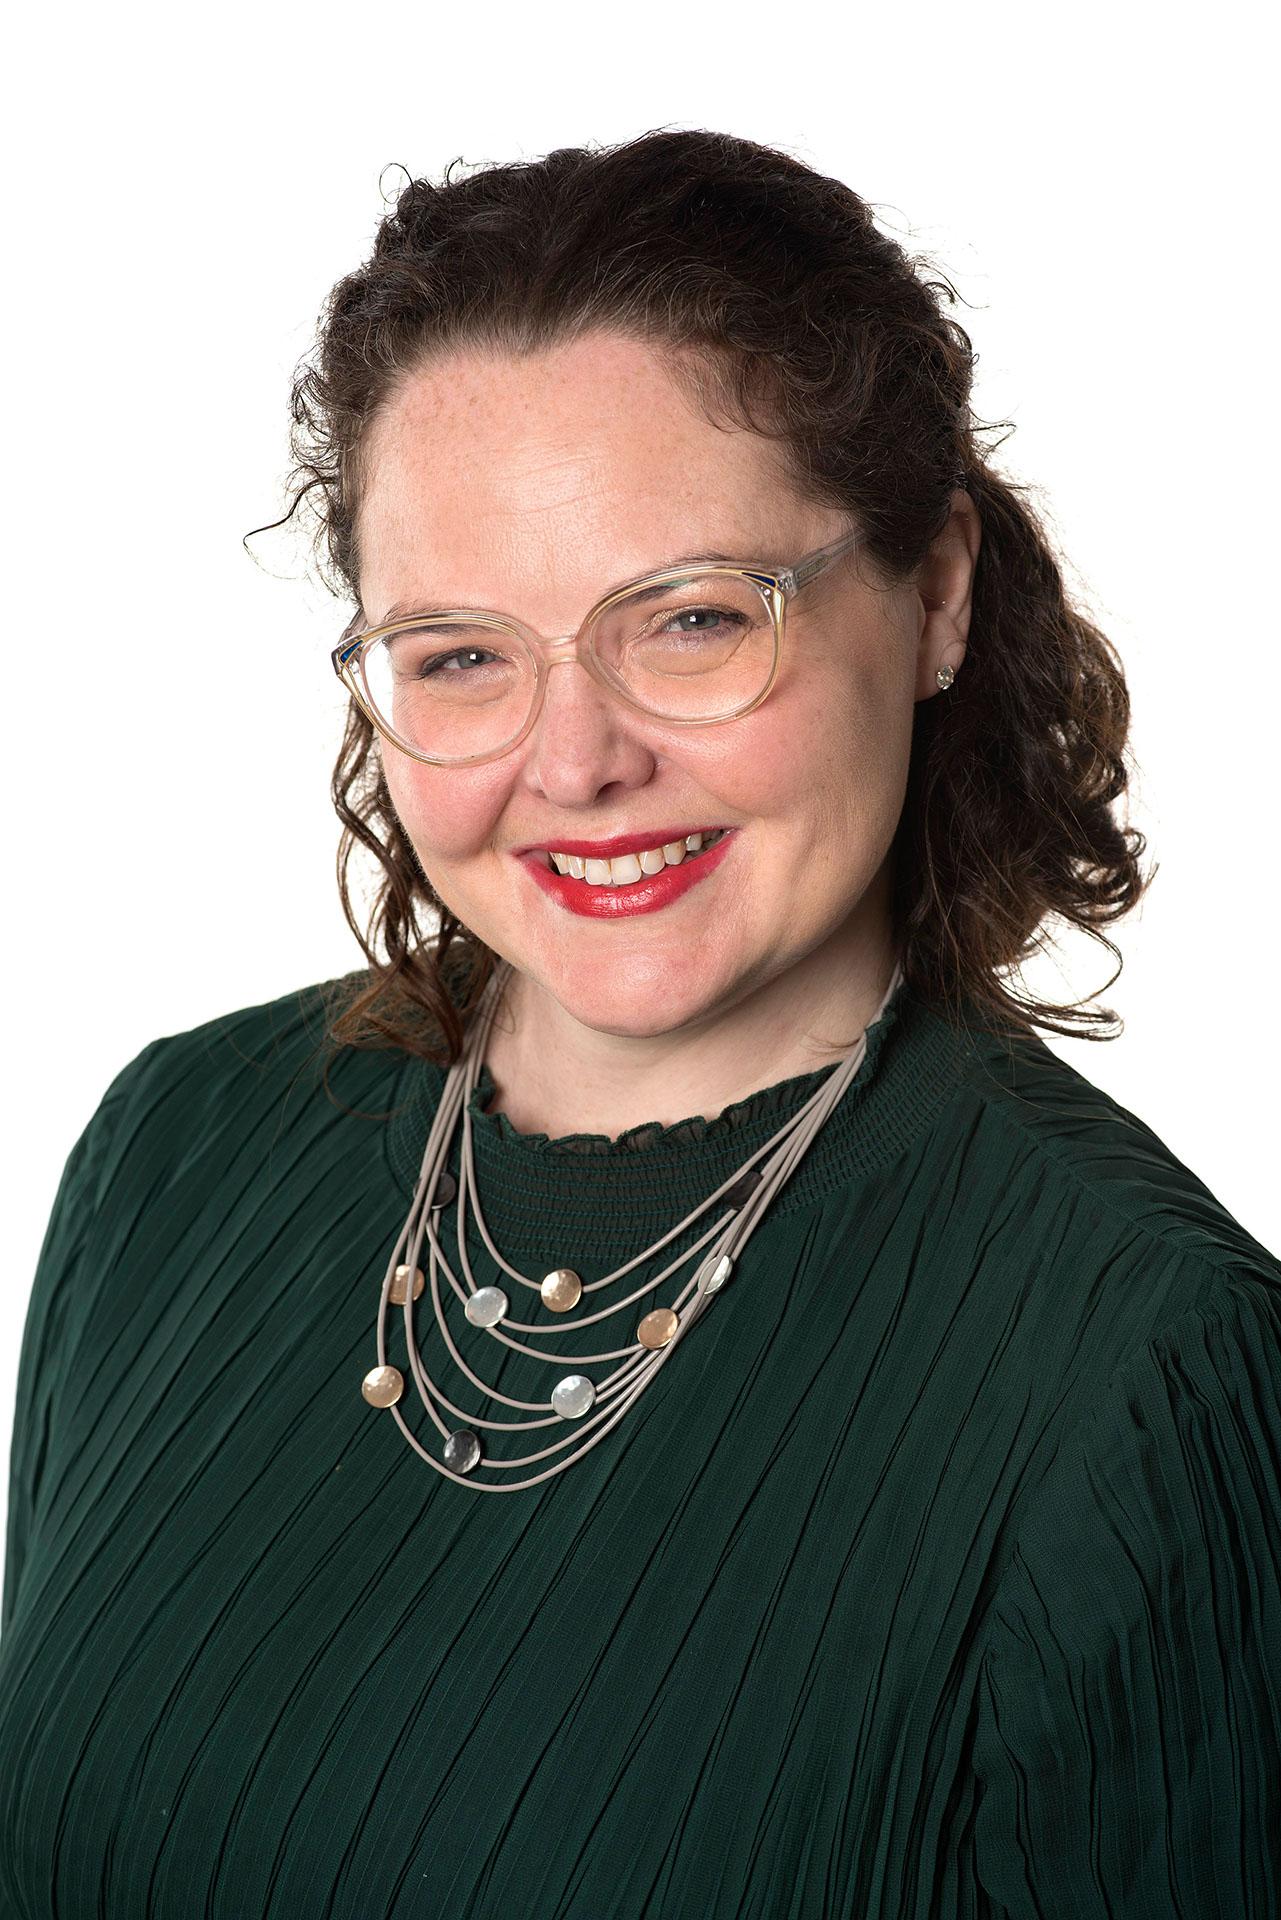 Simone Mangelsdorf Collett